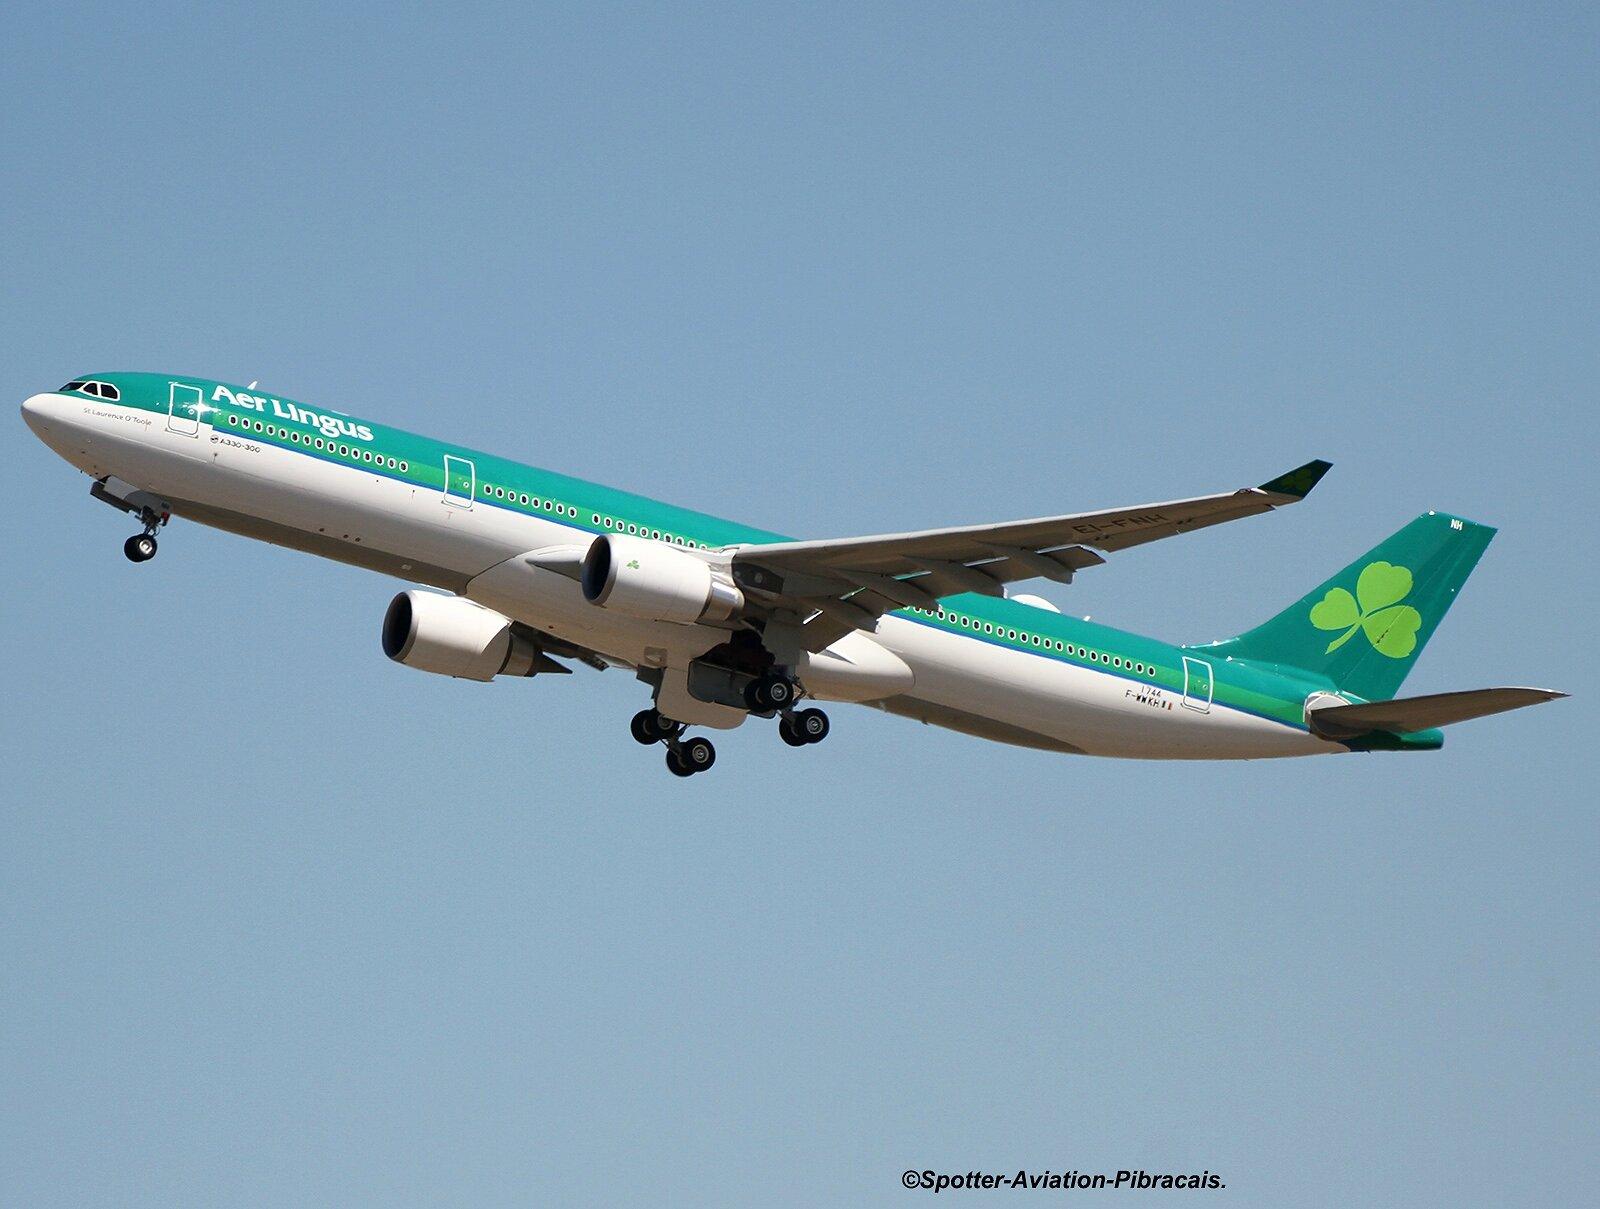 Aer Lingus